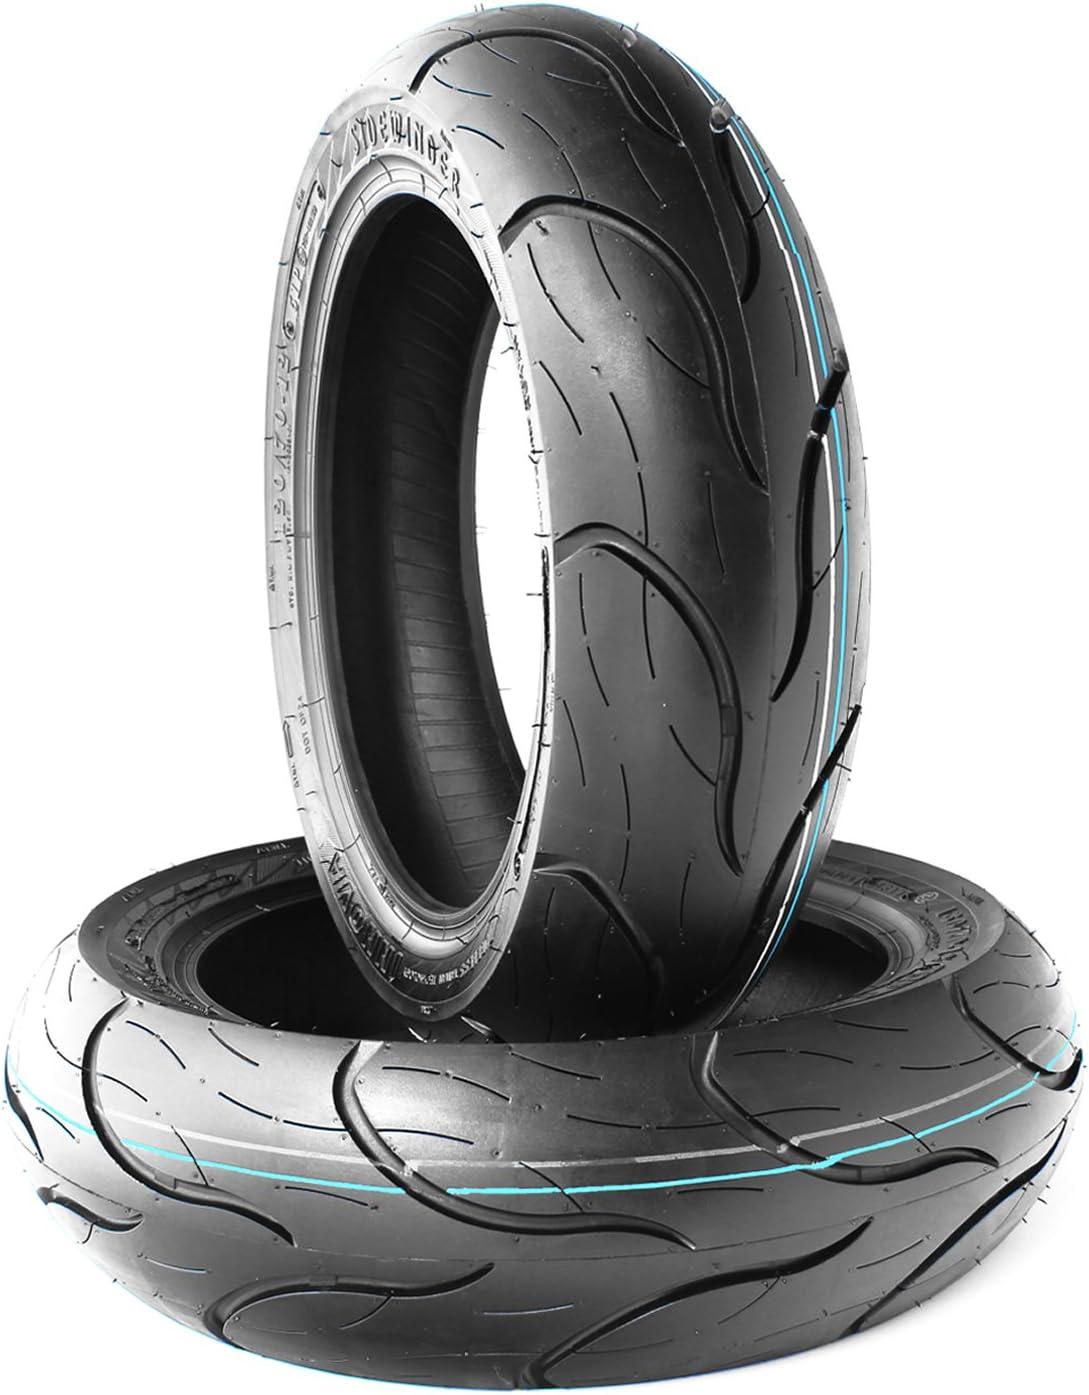 Innova Roller Reifen Set 120 70 12 130 70 12 Piaggio Skipper 125 Vespa Diesis 50 100 Fly 50 125 Piaggio Mp3 125 Sidewinder Auto